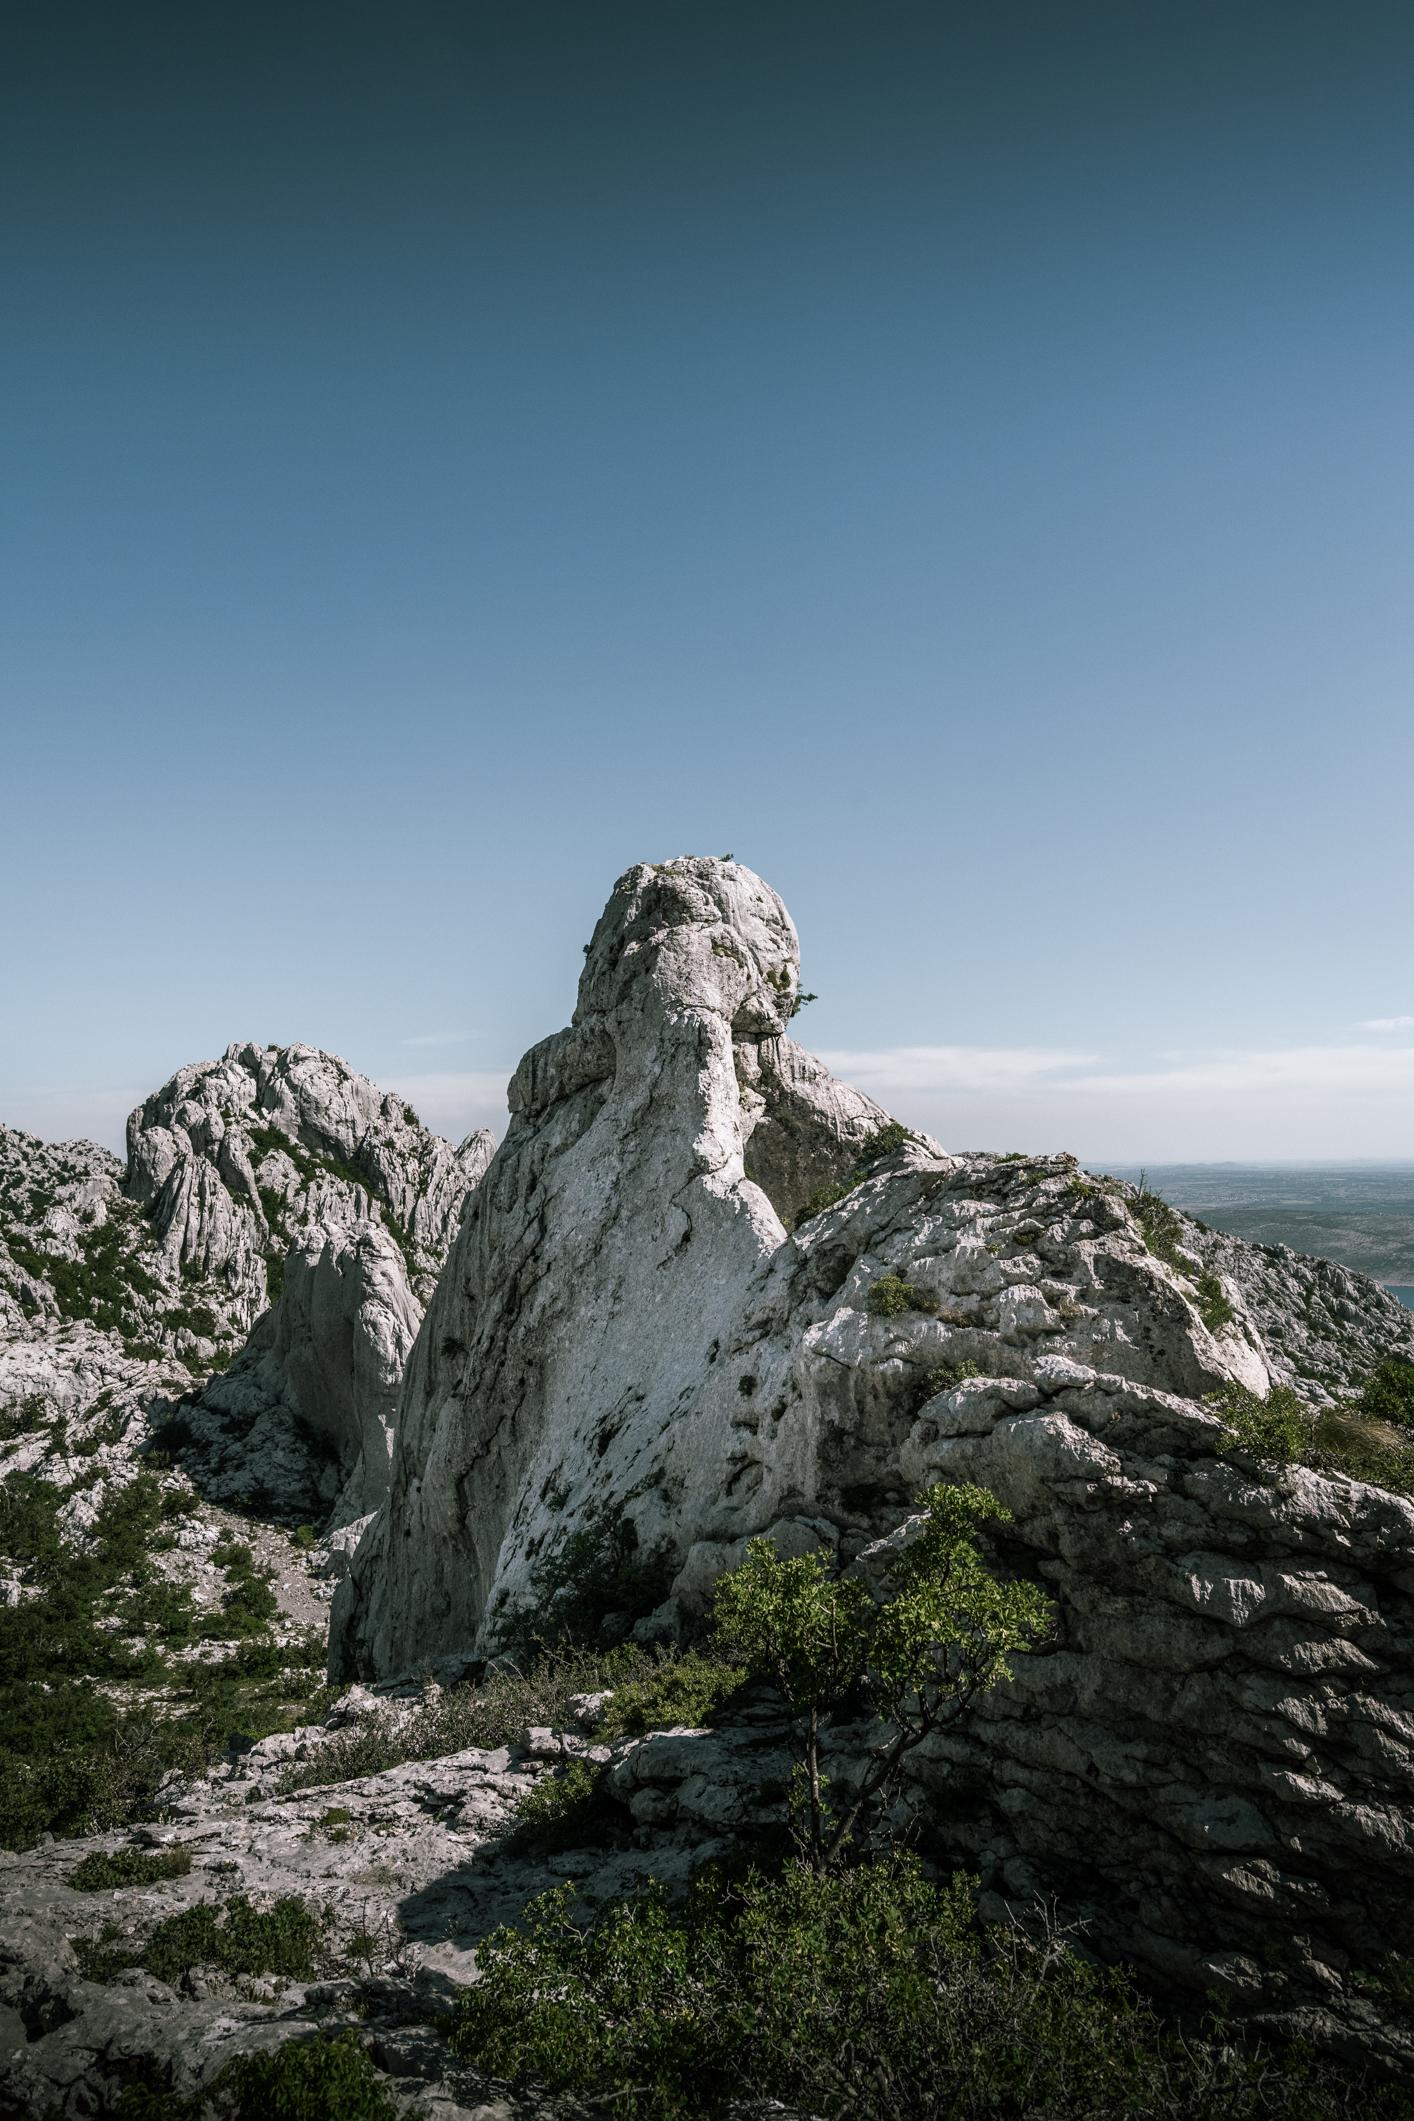 Naturschutzgebiet in Kroatien